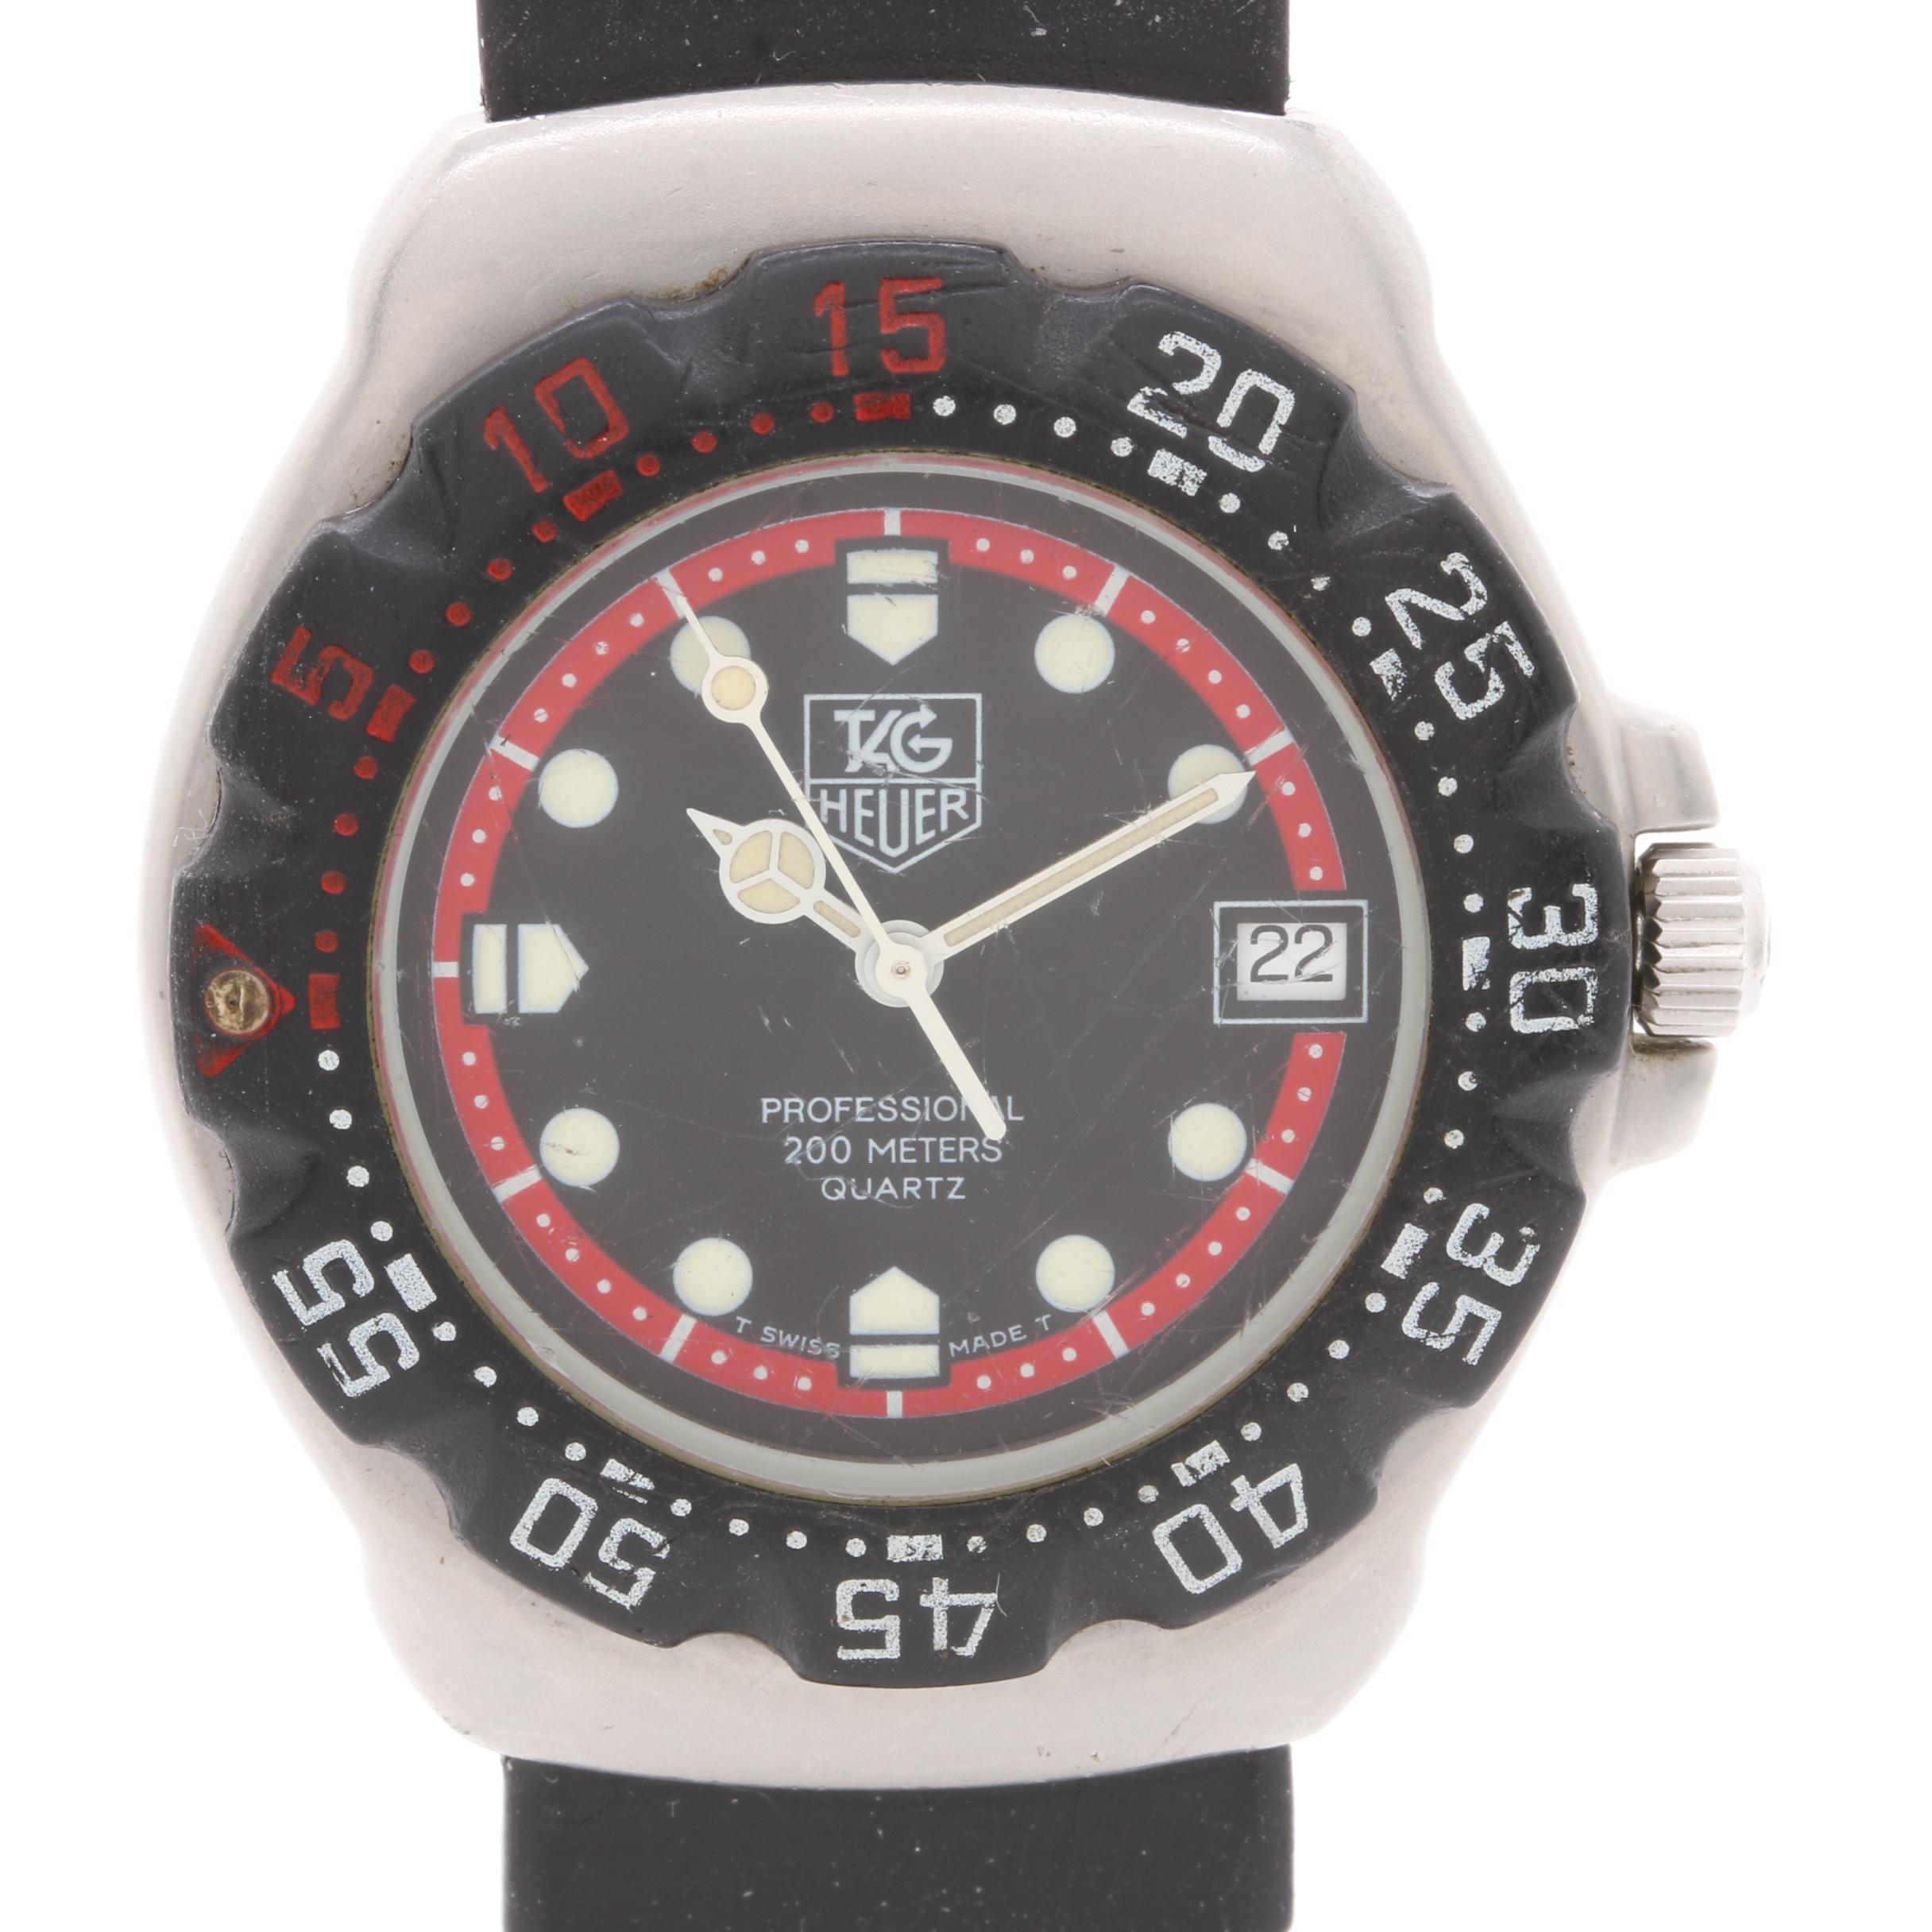 TAG Heuer Formula 1 Series 374.513 Wristwatch